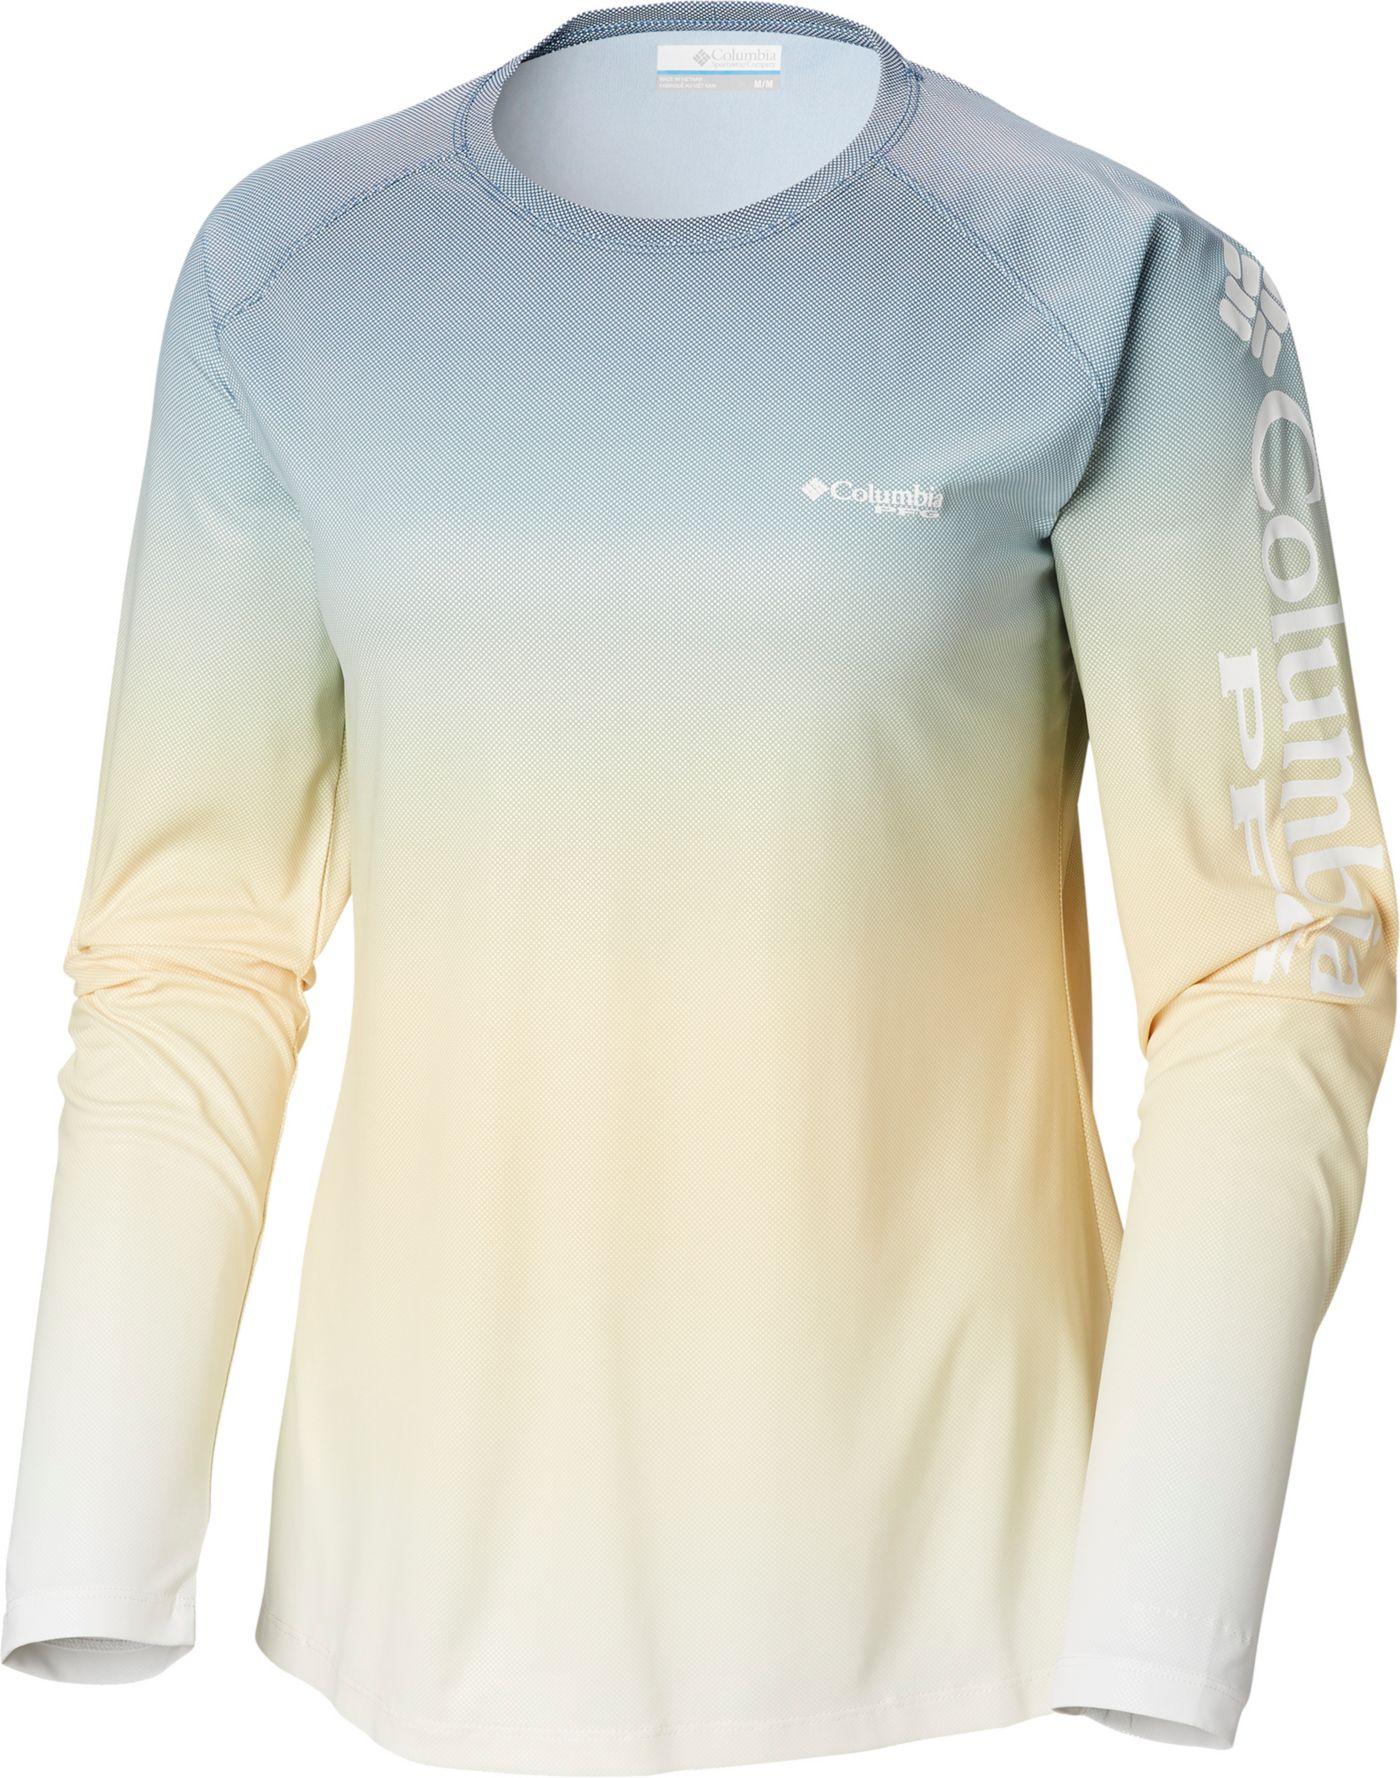 Columbia Tidal Deflector Long Sleeve Shirt